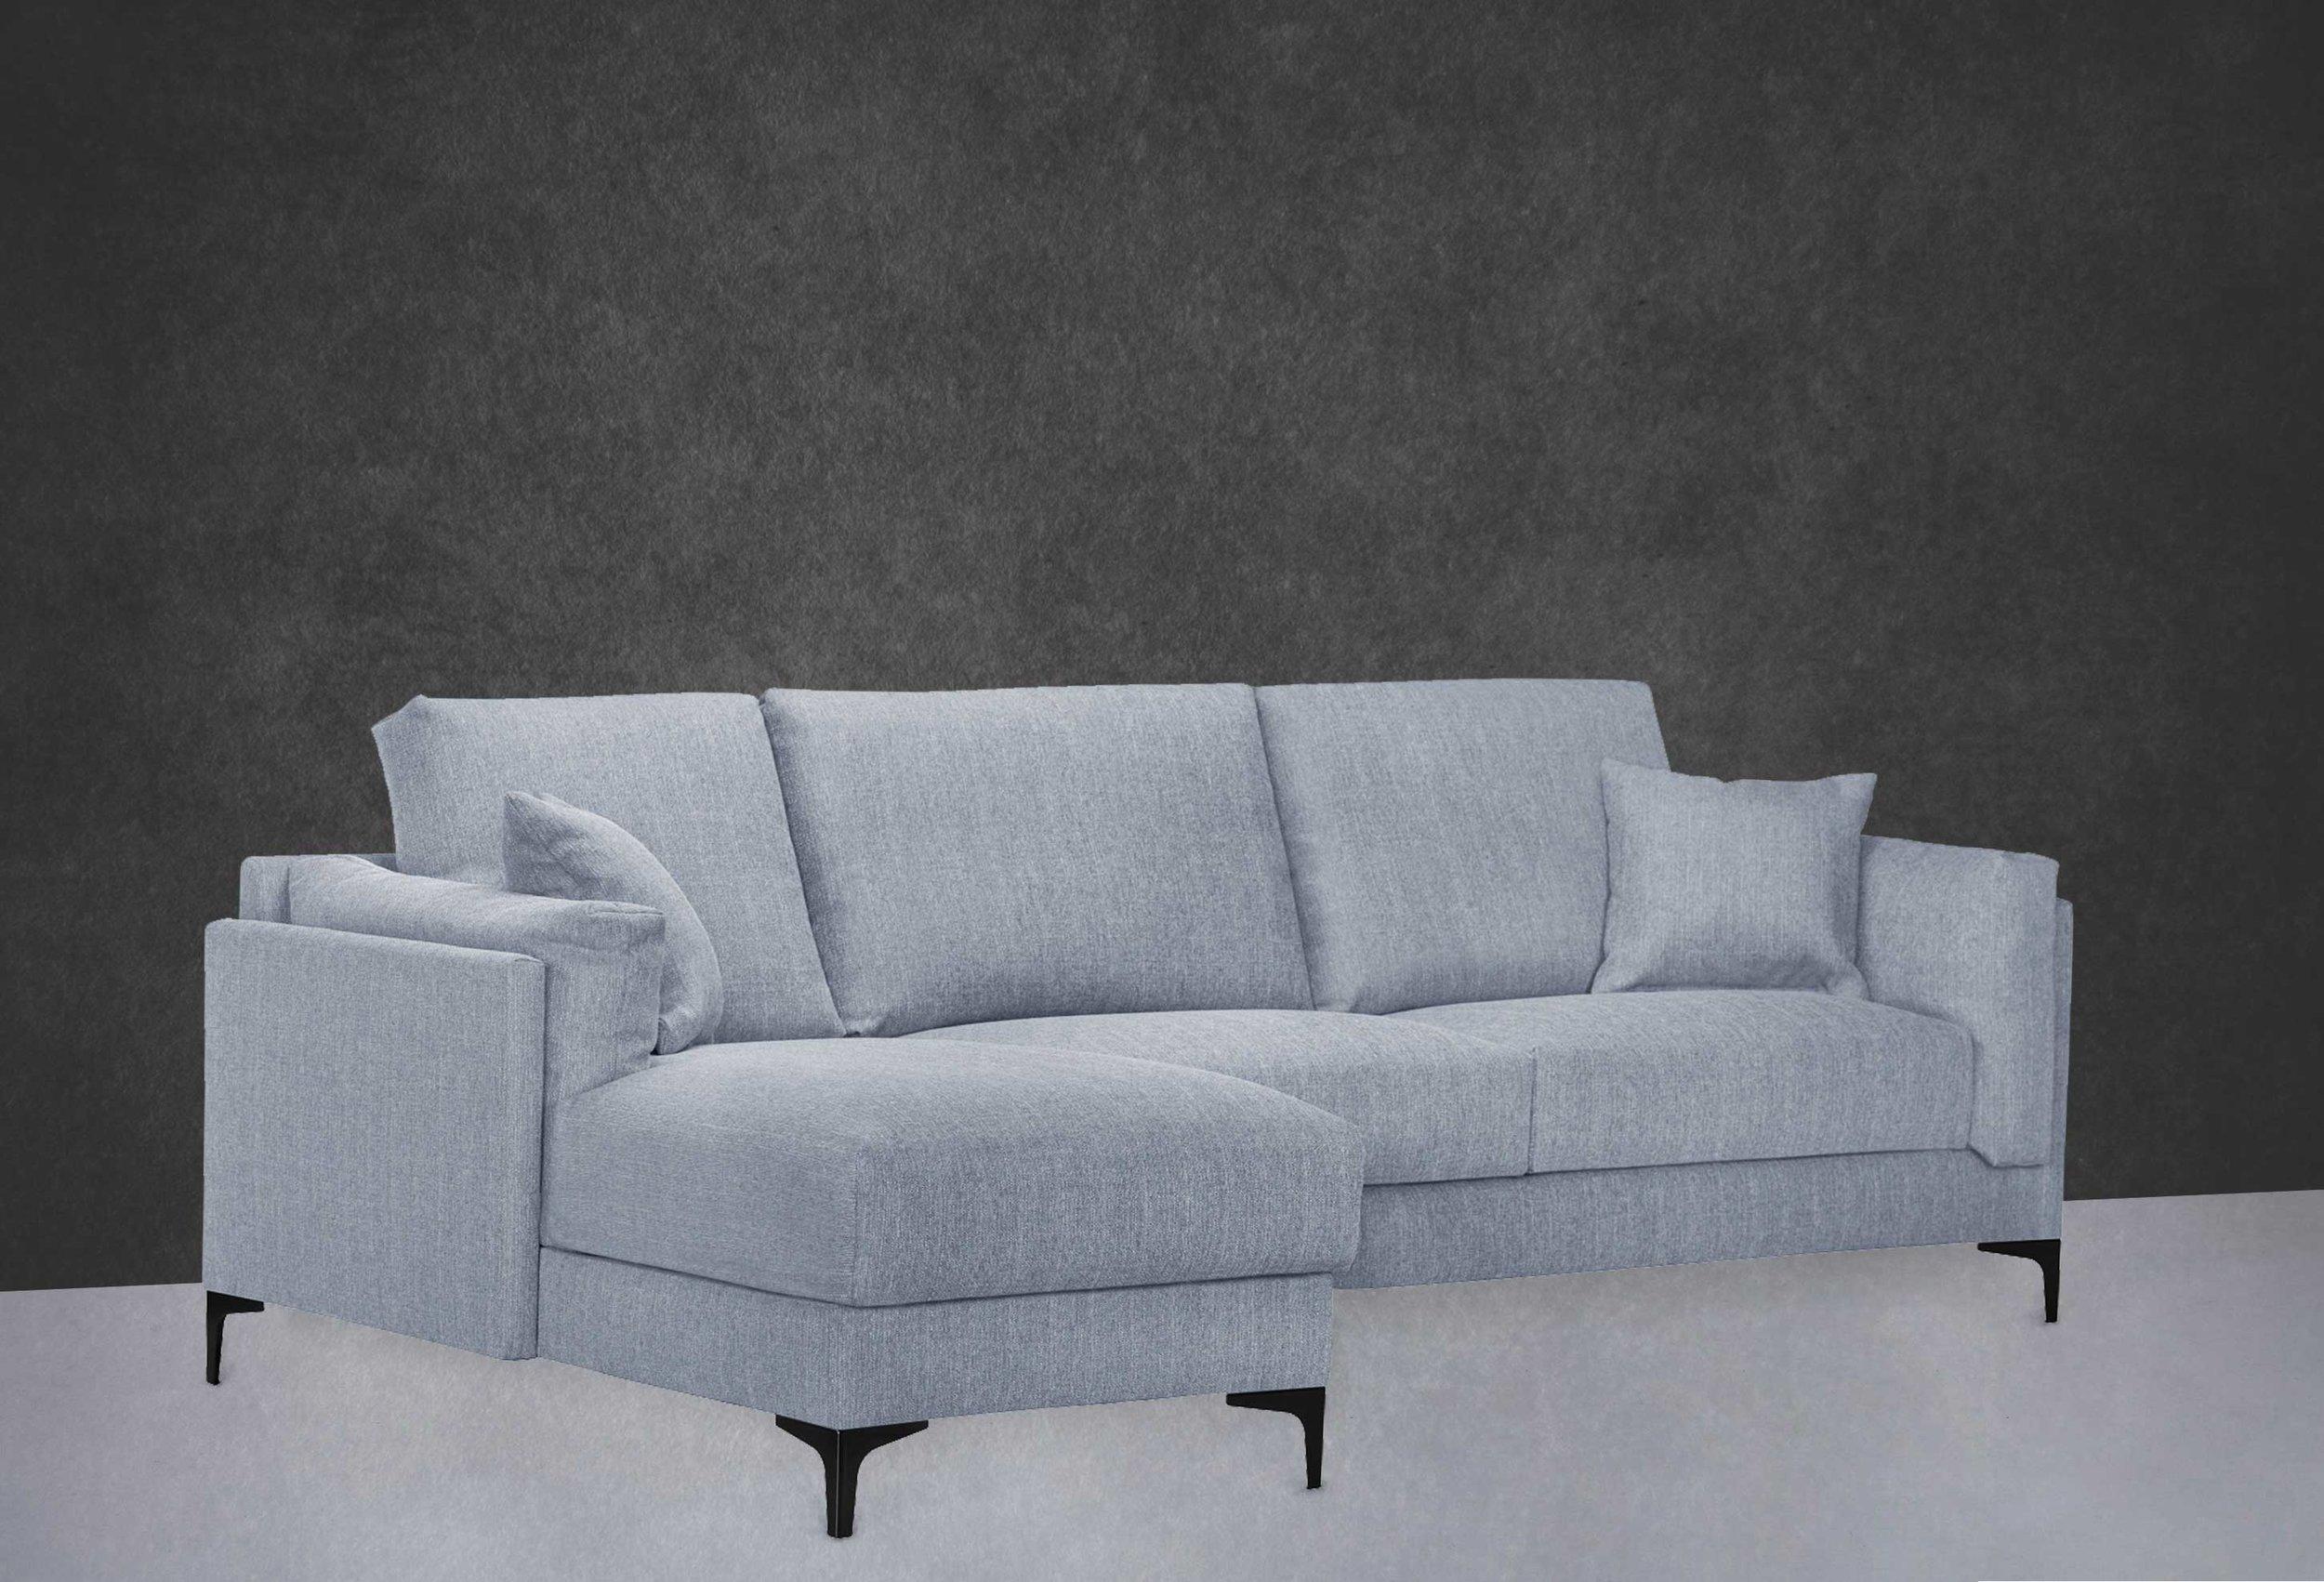 _guy-laroch_LE_MILE_Magazine_LE_MILE_SeLECTED_European_Furniture_Design_2018.jpg